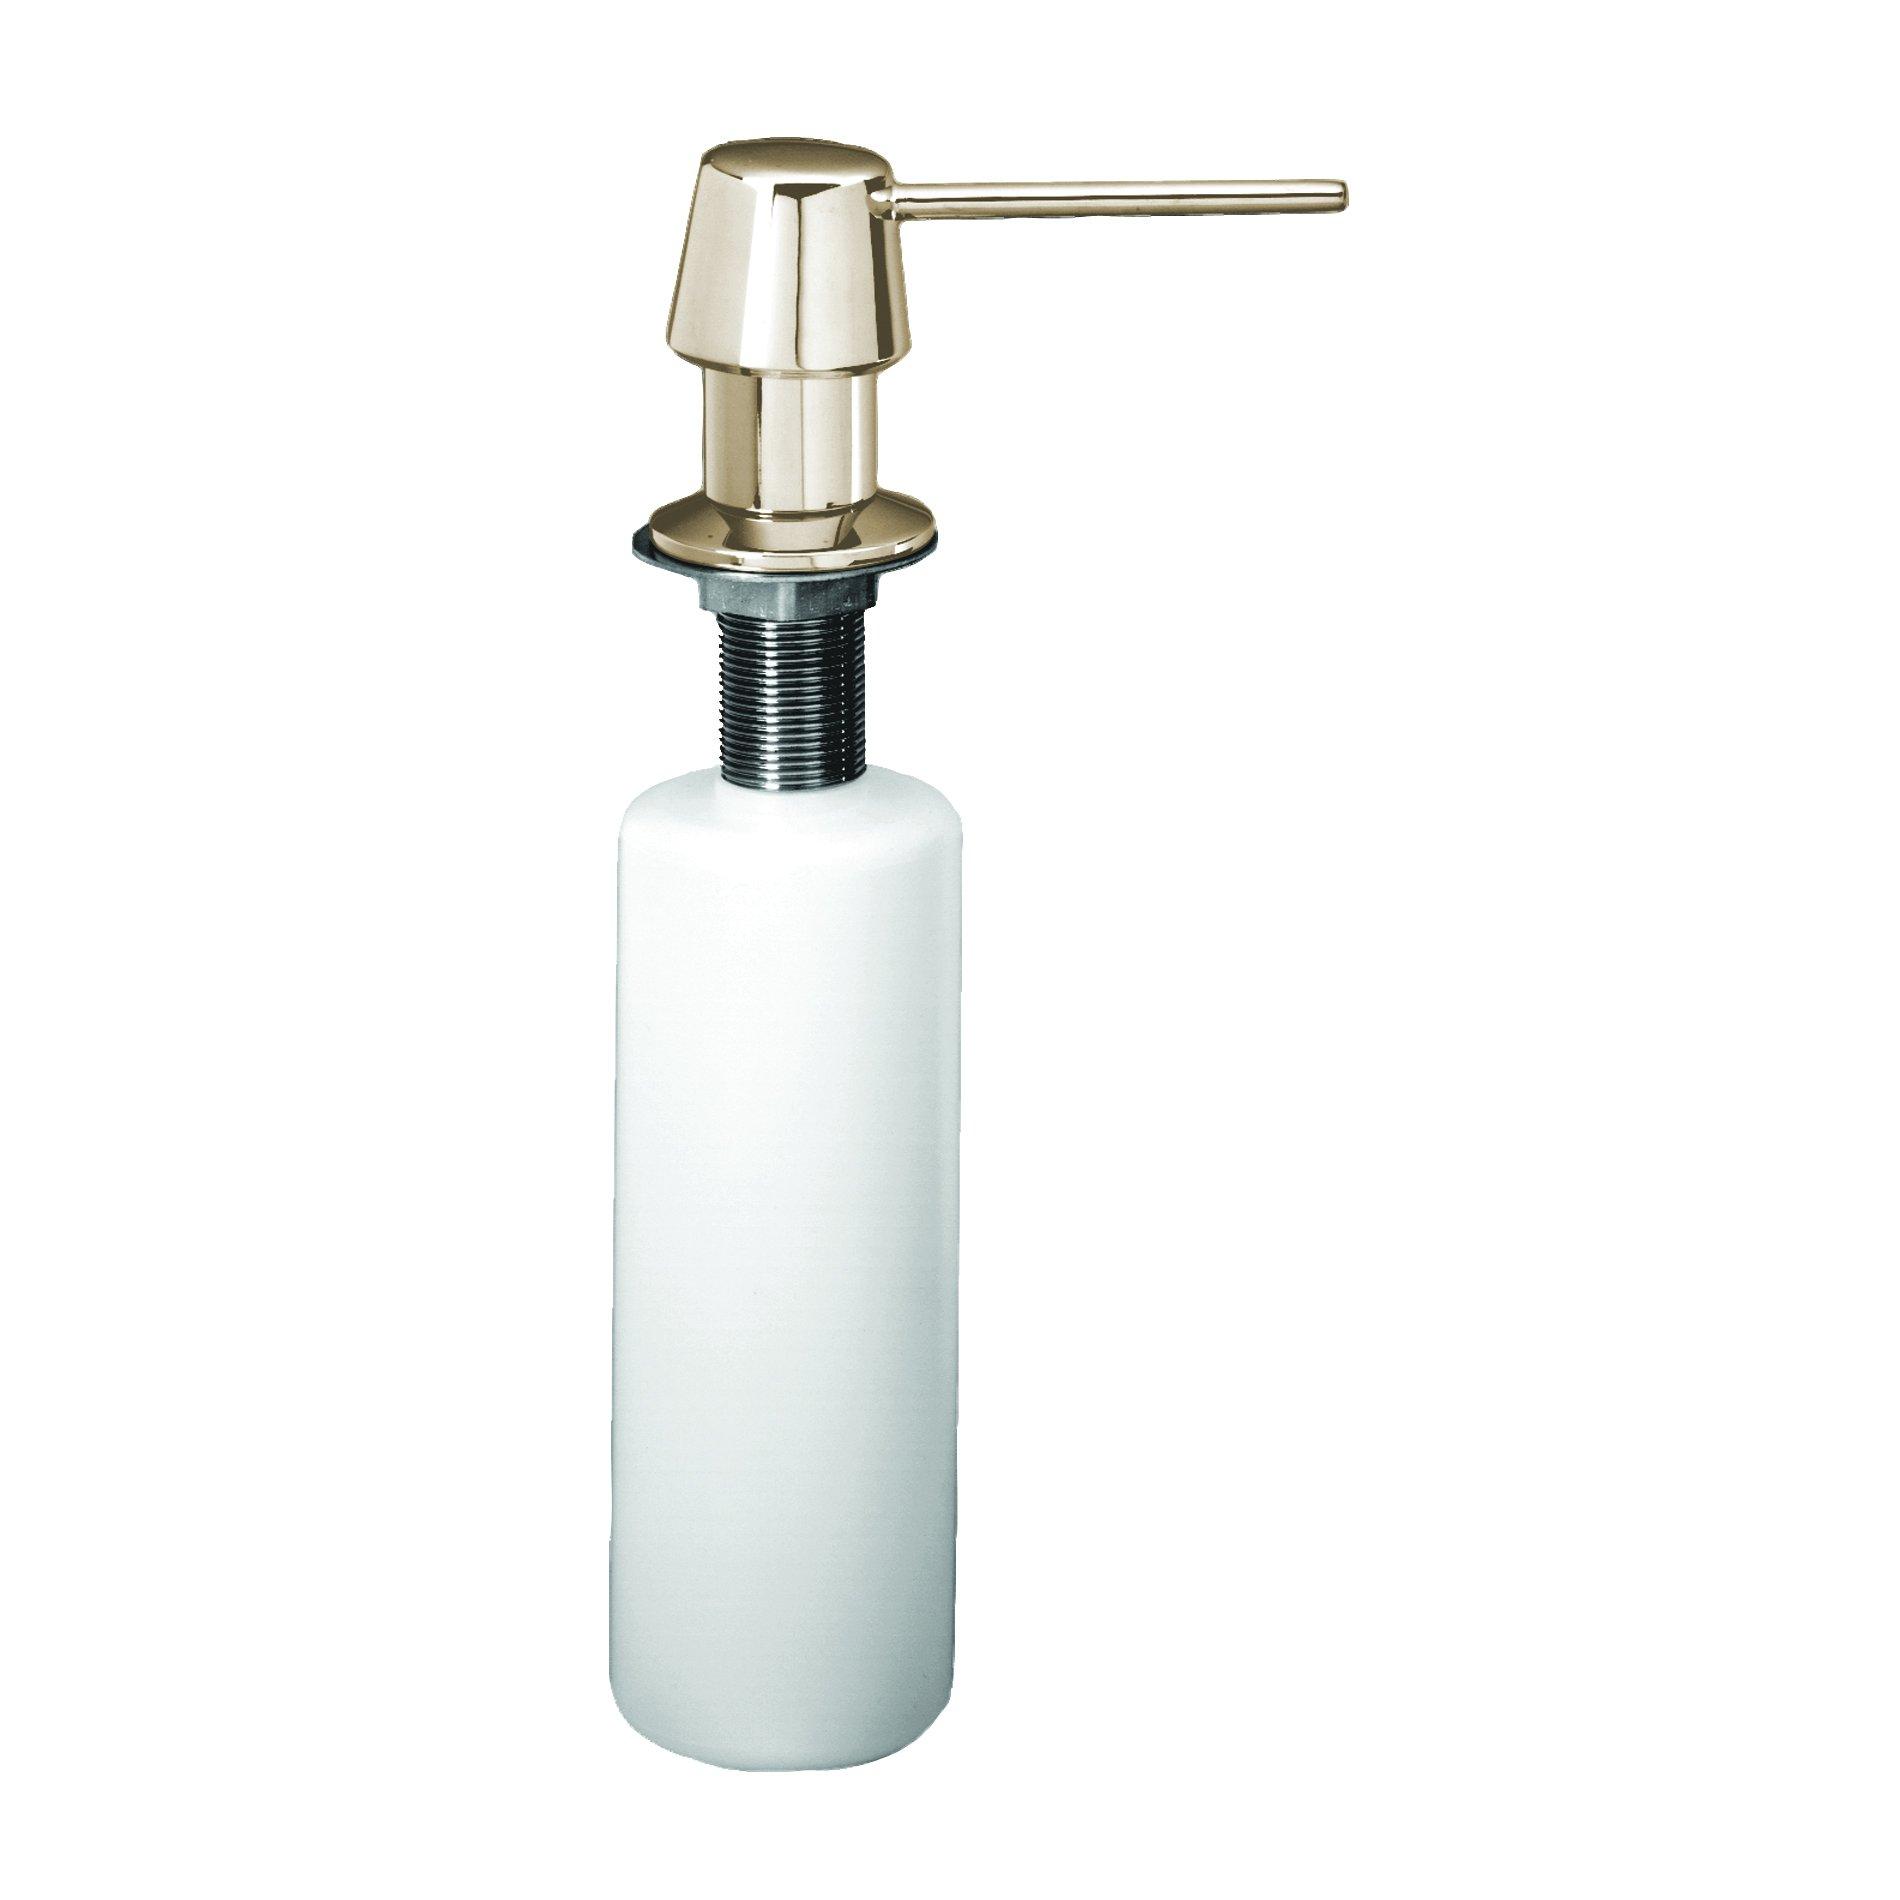 Westbrass R217-05 Standard Soap/Lotion Dispenser, Polished Nickel